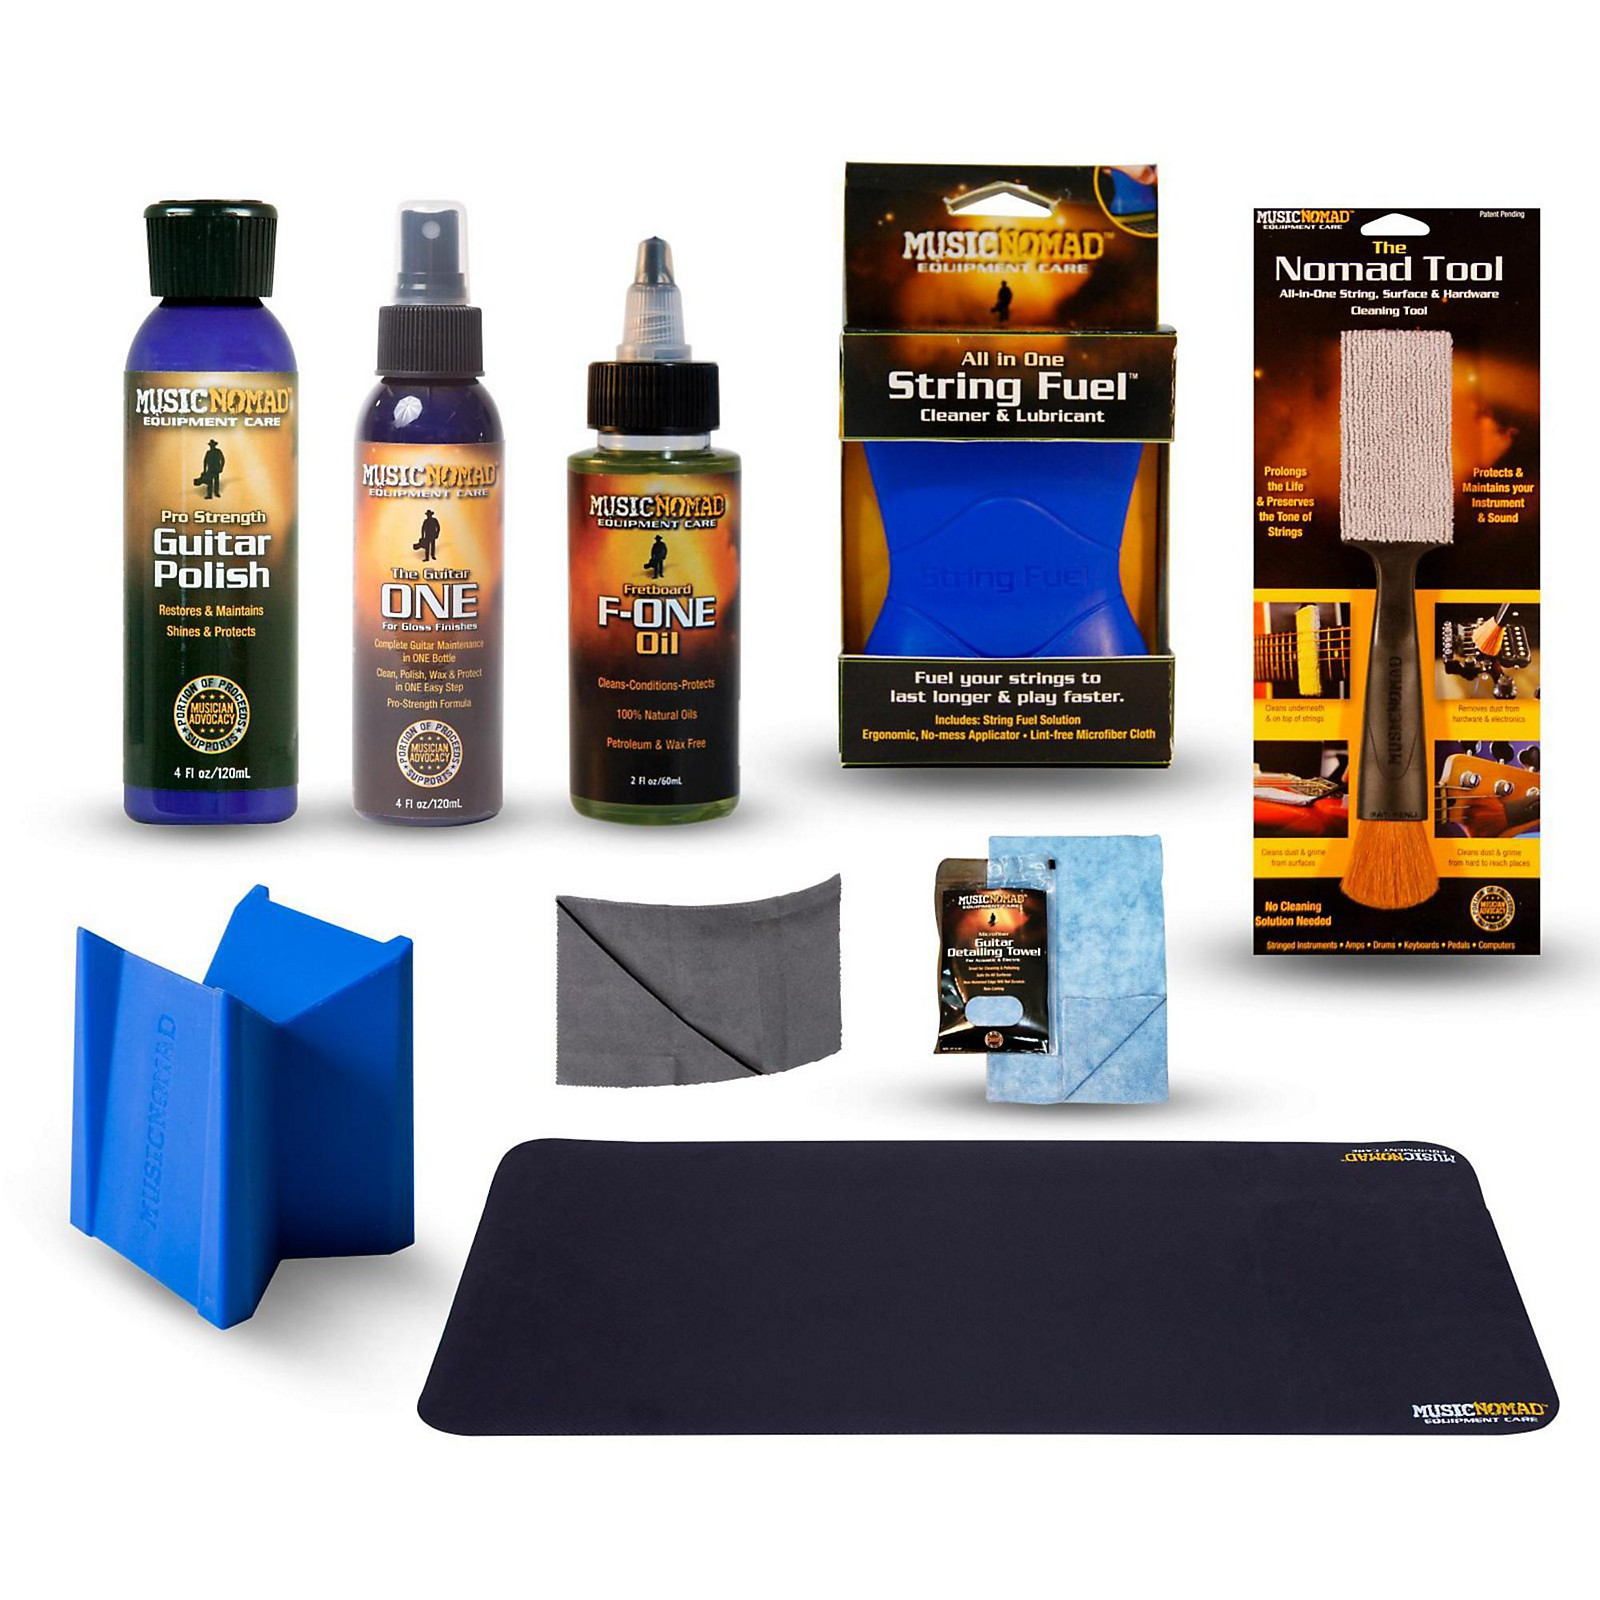 MusicNomad Complete 9-Piece Premium Guitar Care Kit